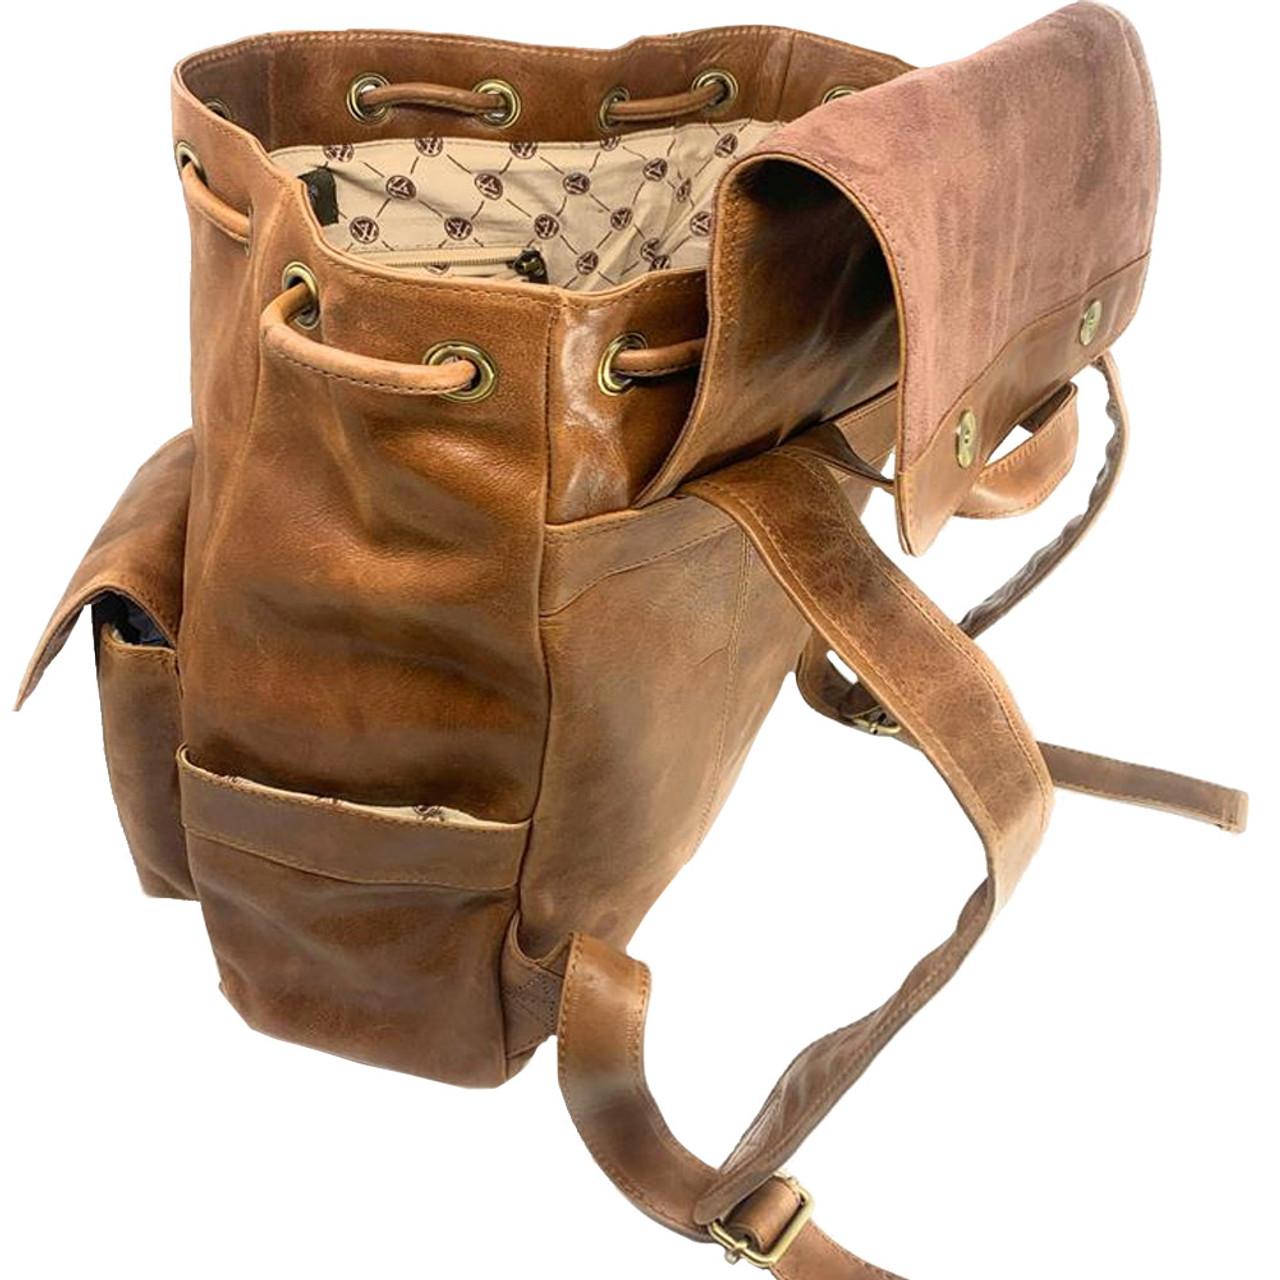 NCSU NC State Wolfpack Leather Rucksack Tan Westbridge Backpack